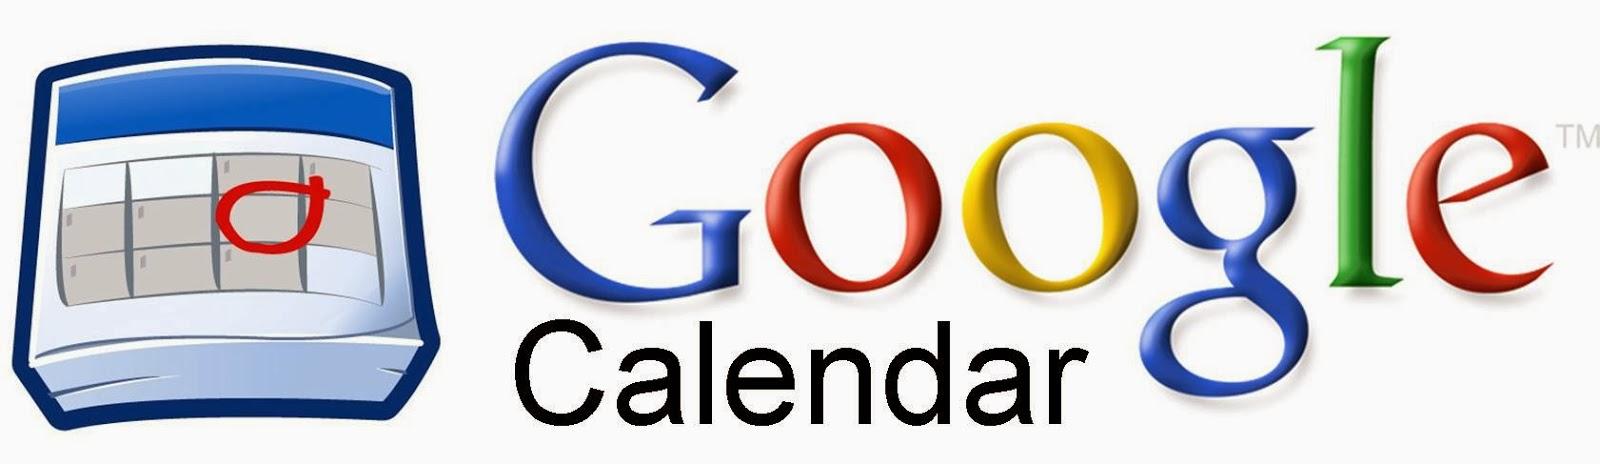 Controle de treinos de corrida - Google Calendar